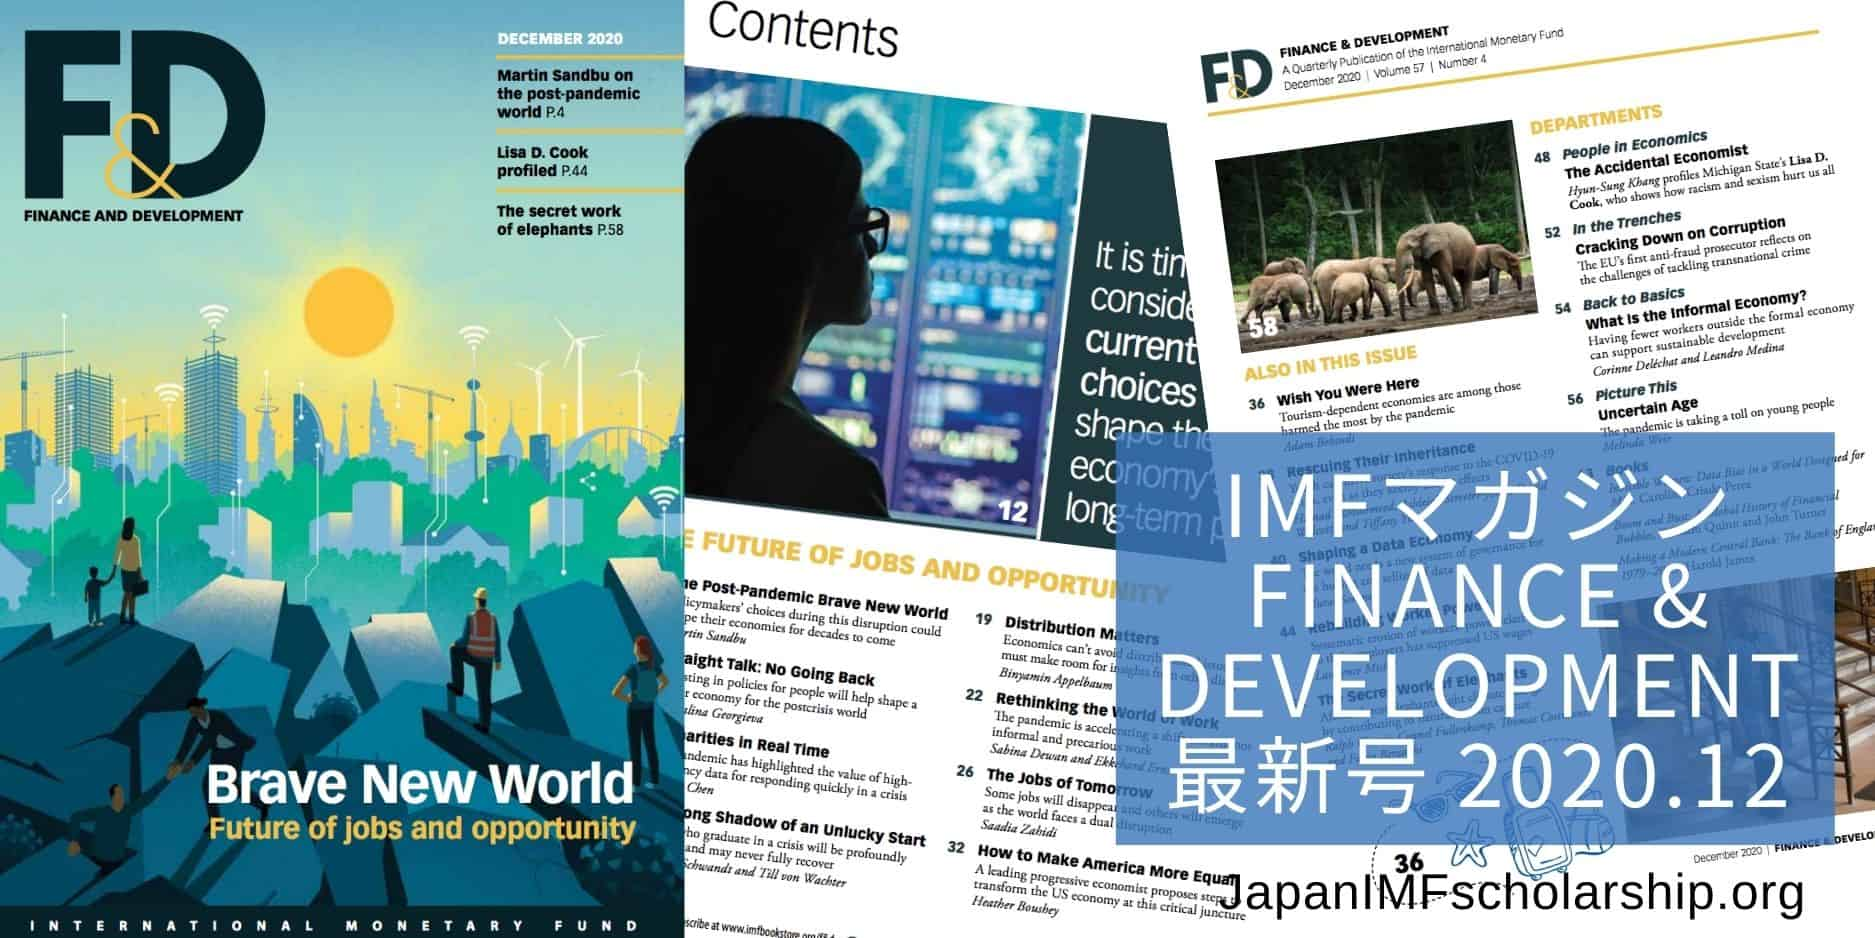 jisp web-fb imf magazine finance and development brave new world december 2020